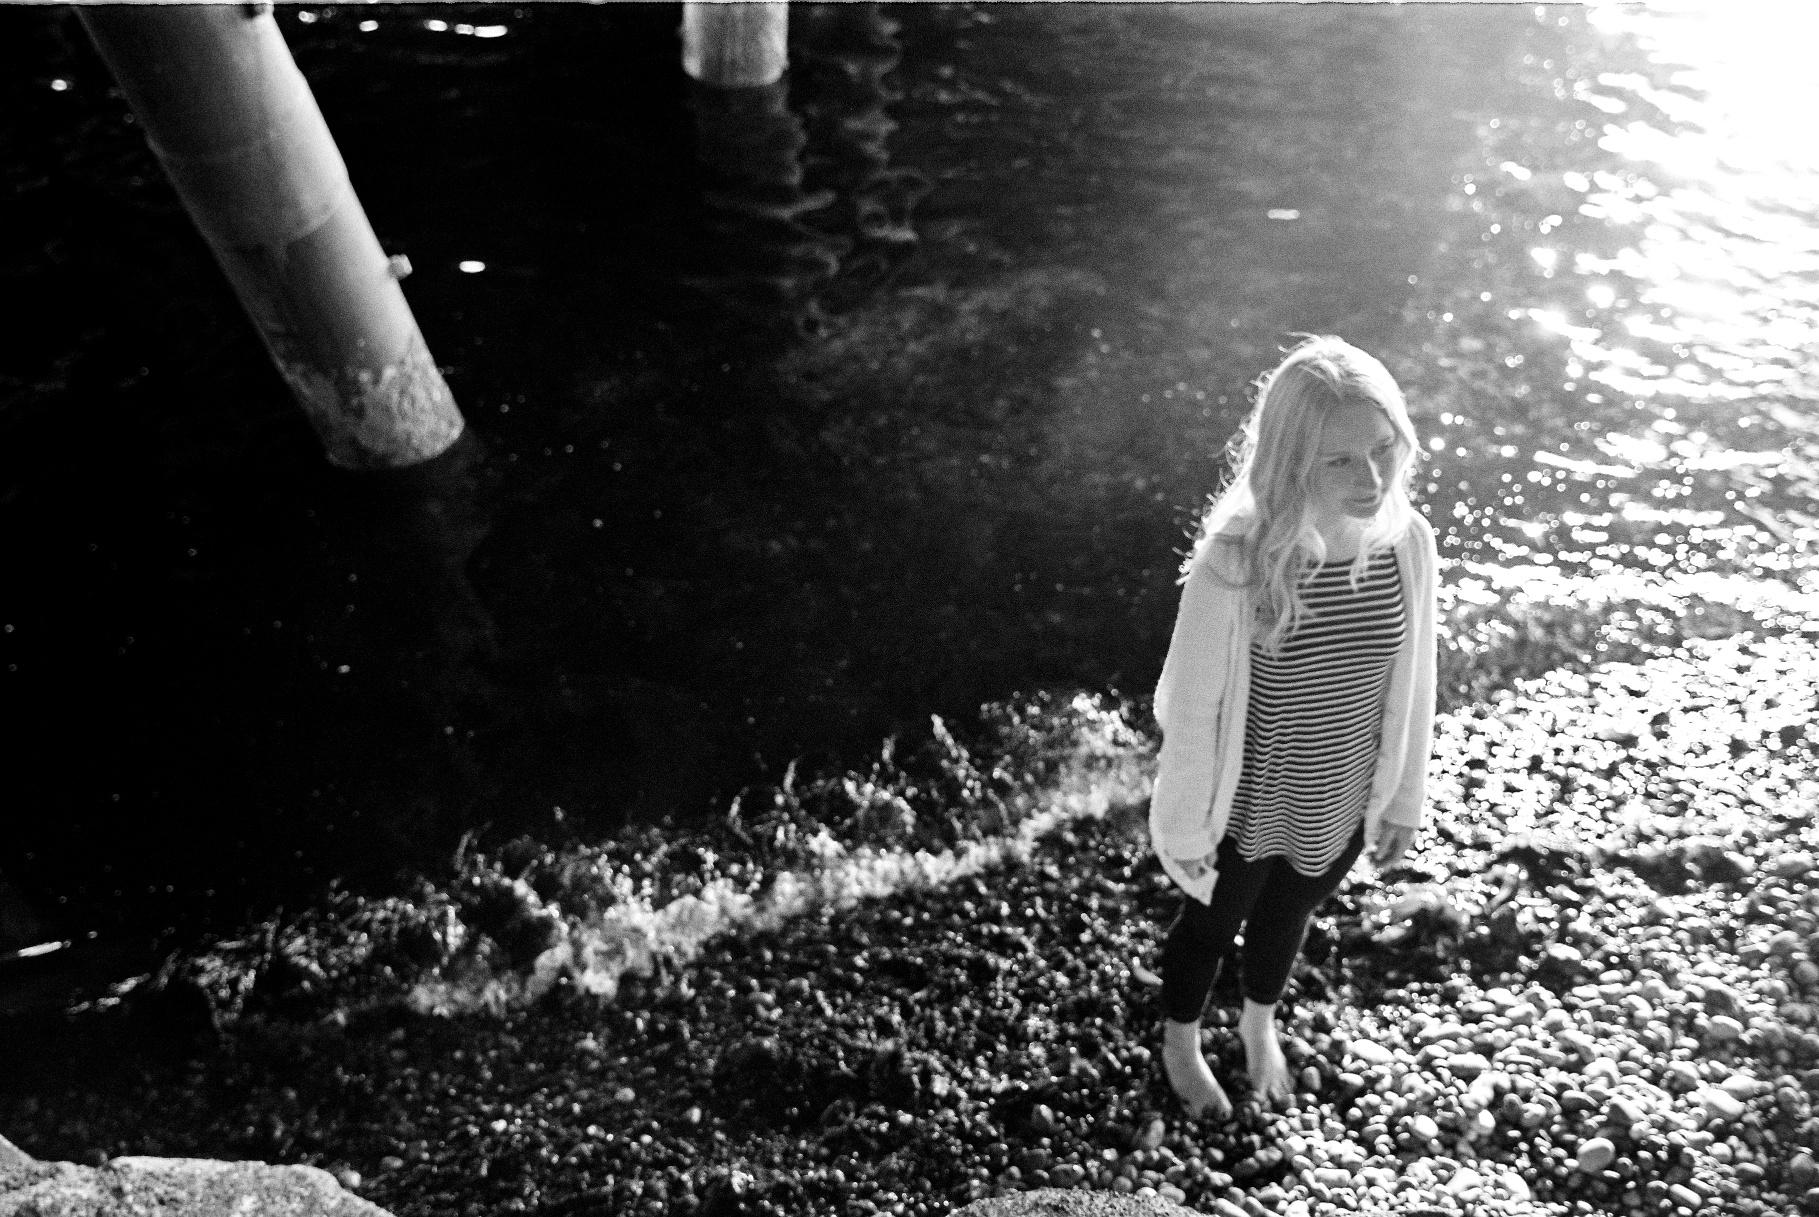 seattle film photographer senior pictures photos alki beach west seattle ocean canon kodak black and white 400 film